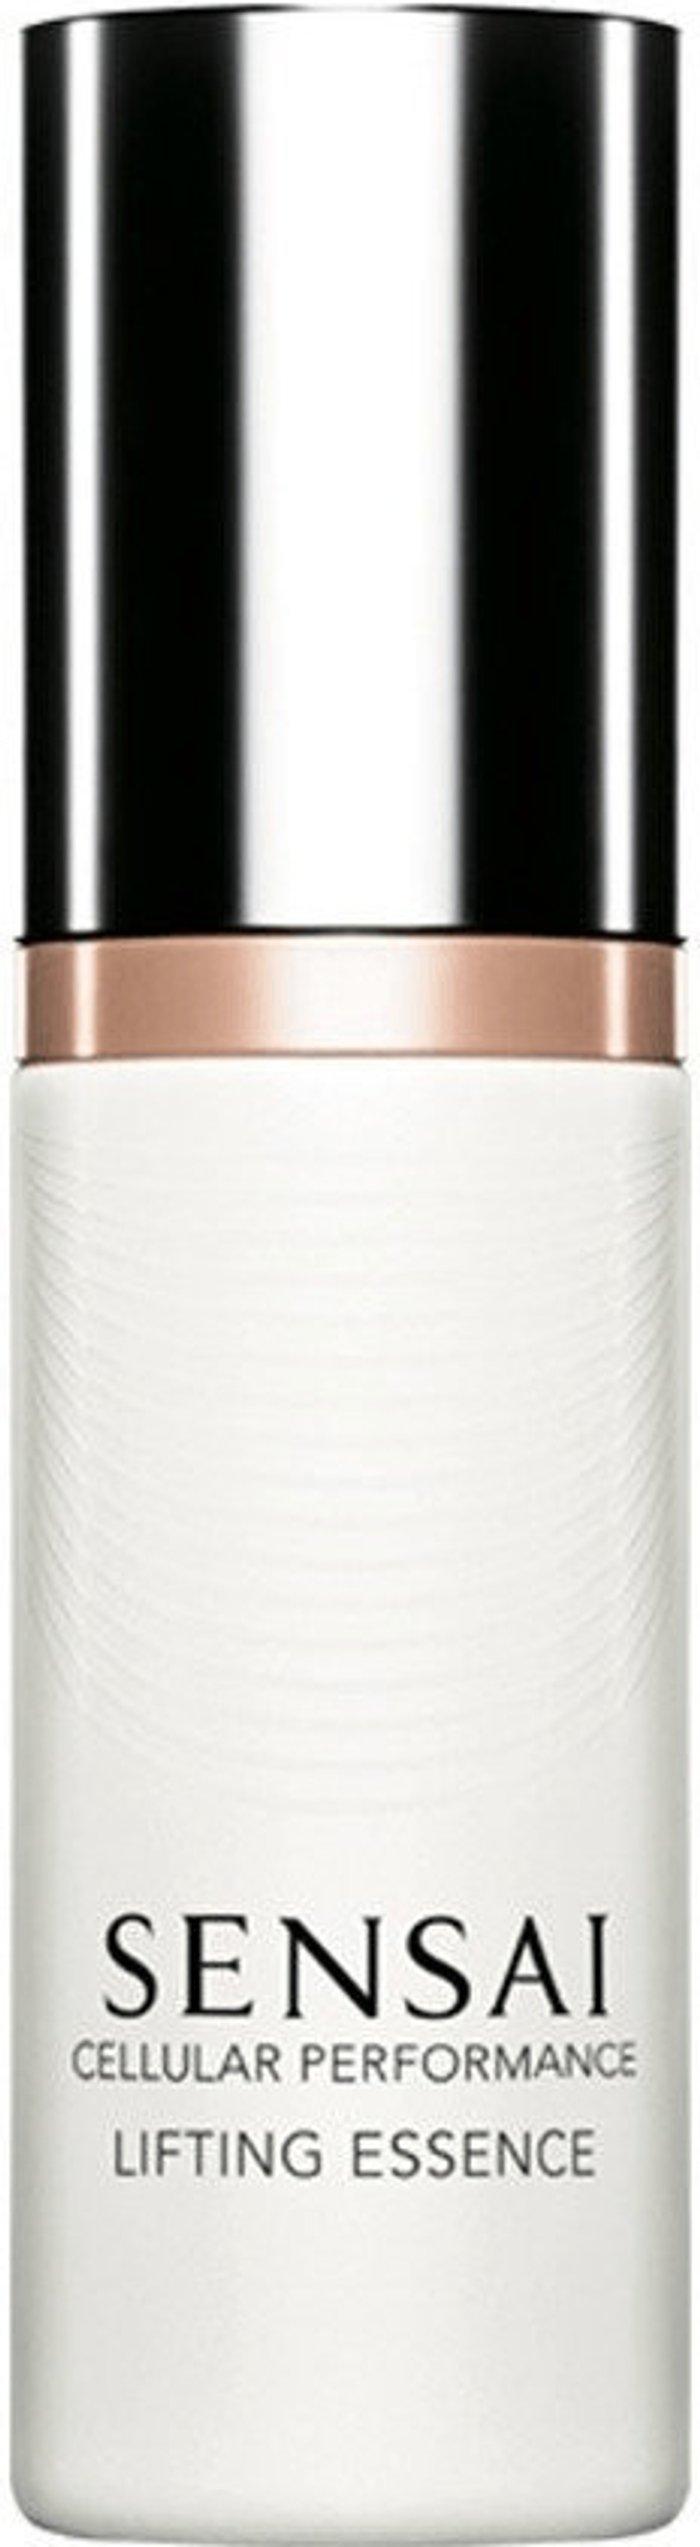 Kanebo Kanebo Sensai Cellular Lifting Essence (40ml)